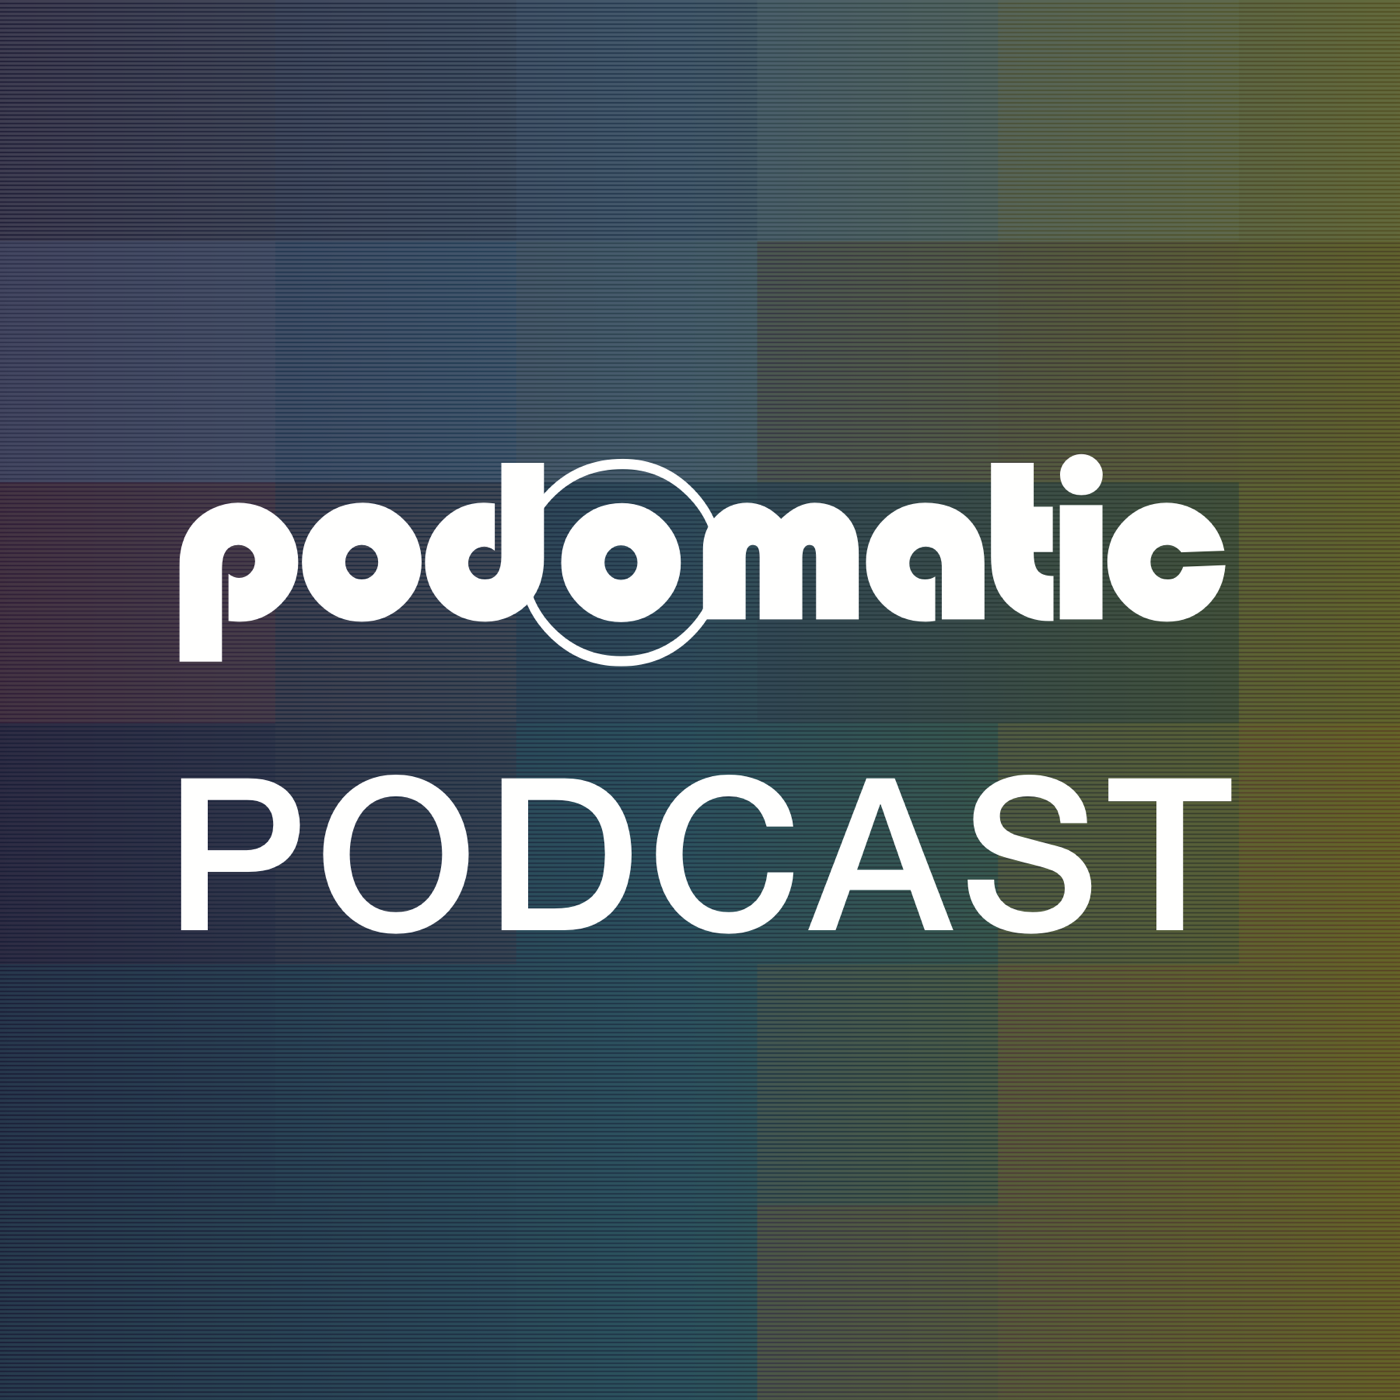 Aidan Spelbring's Podcast